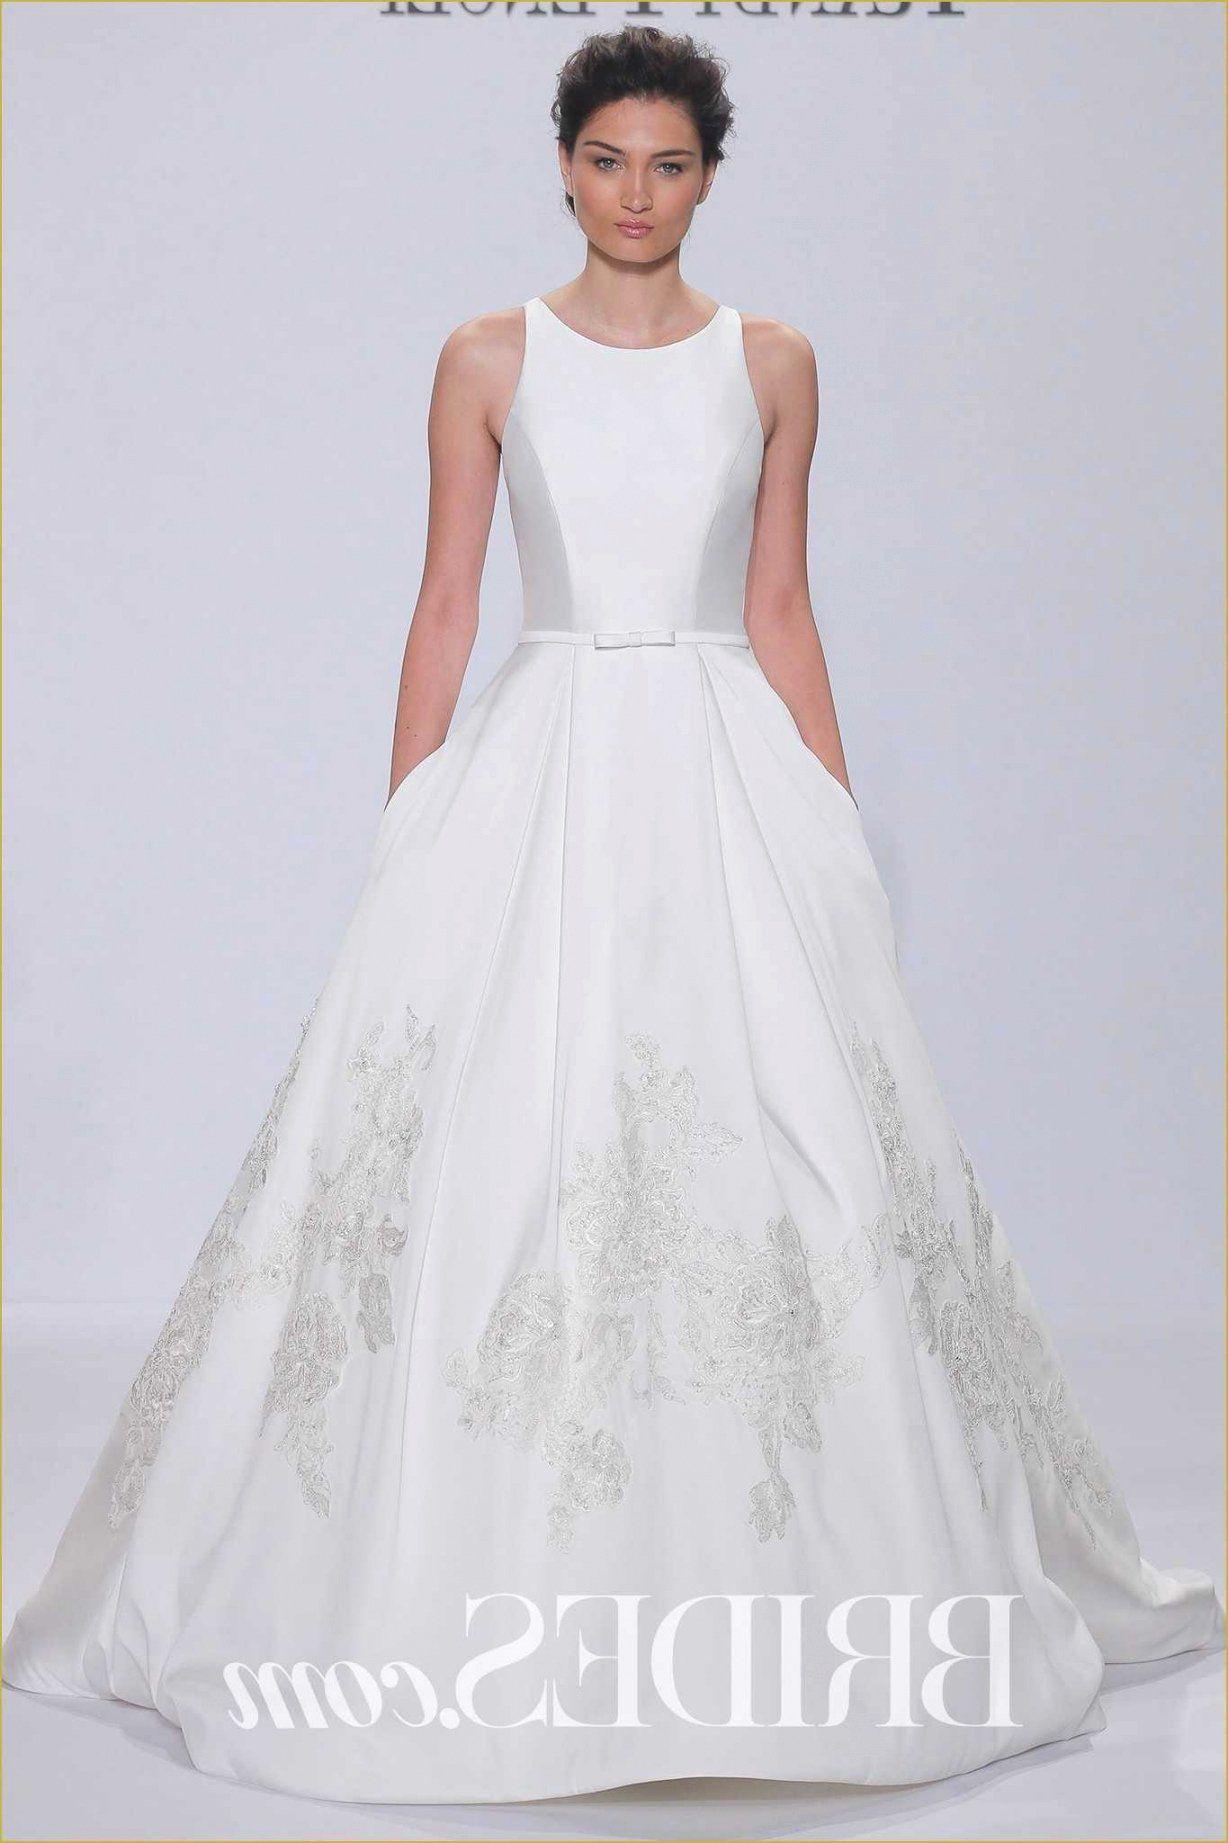 Wedding Dress Rentals In Dallas Texas Lovely 15 Timeless Borrow Wedding Dress Wedding Dress In 2020 Wedding Dresses Kleinfeld Wedding Dress Long Sleeve Wedding Dresses